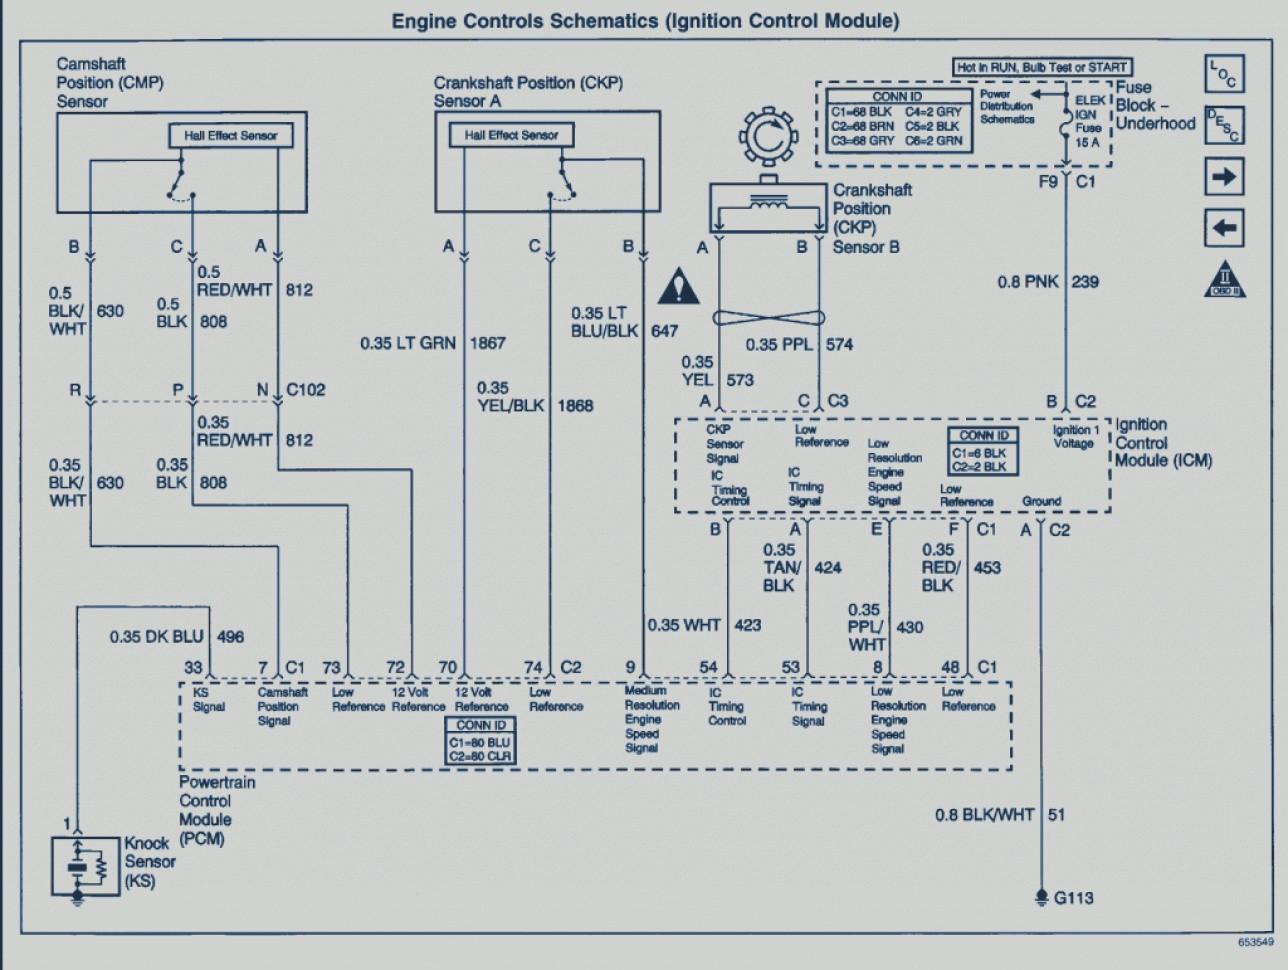 1996 pontiac grand prix radio wiring diagrams wiring diagram 2005 jeep grand cherokee radio wiring diagram 1996 pontiac radio wiring diagram